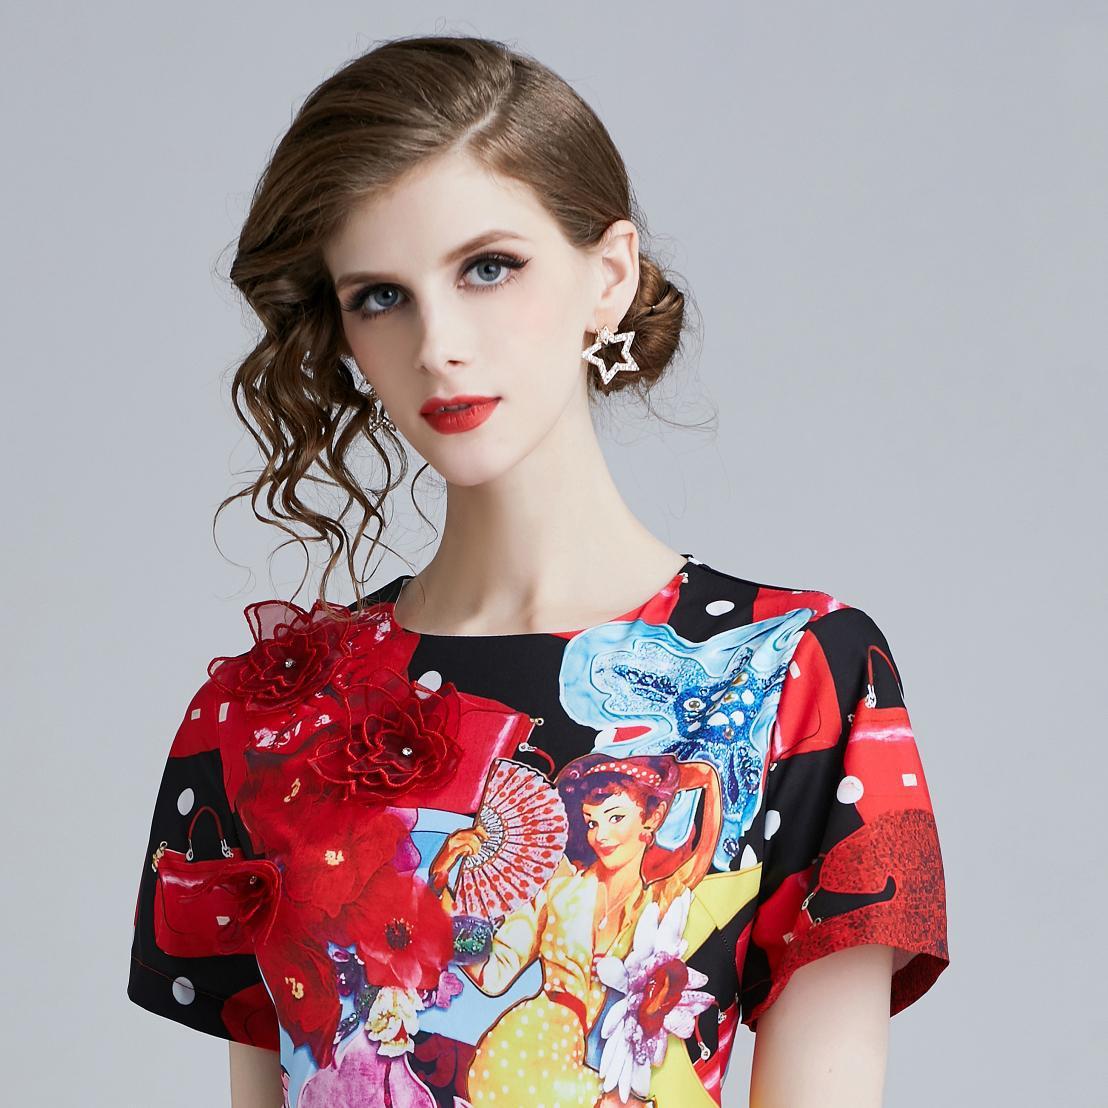 Photo Shoot 5795-Catwalk Models WOMEN'S Dress-Style Elegant Slim Fit Short Sleeve Beauty Floral Printed Dress